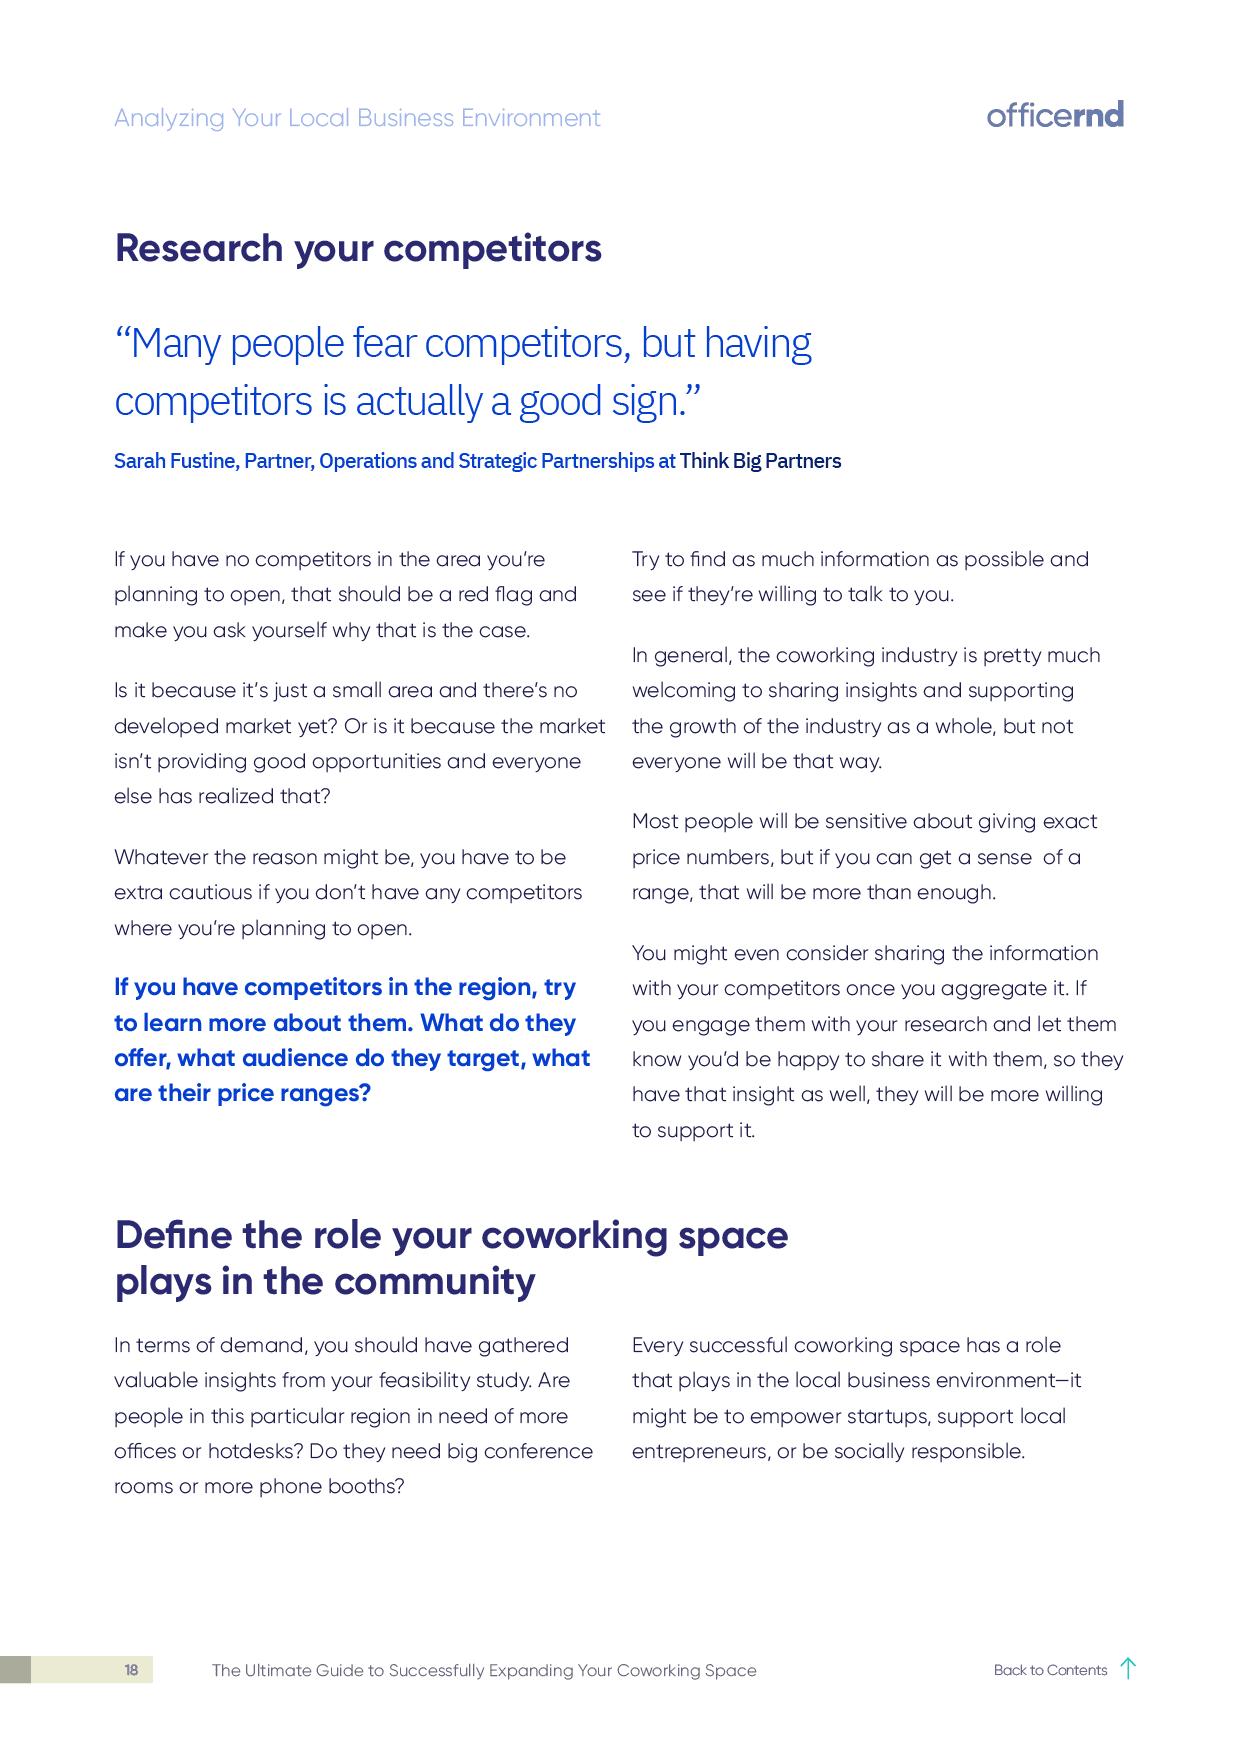 OfficeRnD_Opening_Second_Workspace_Ebook_518